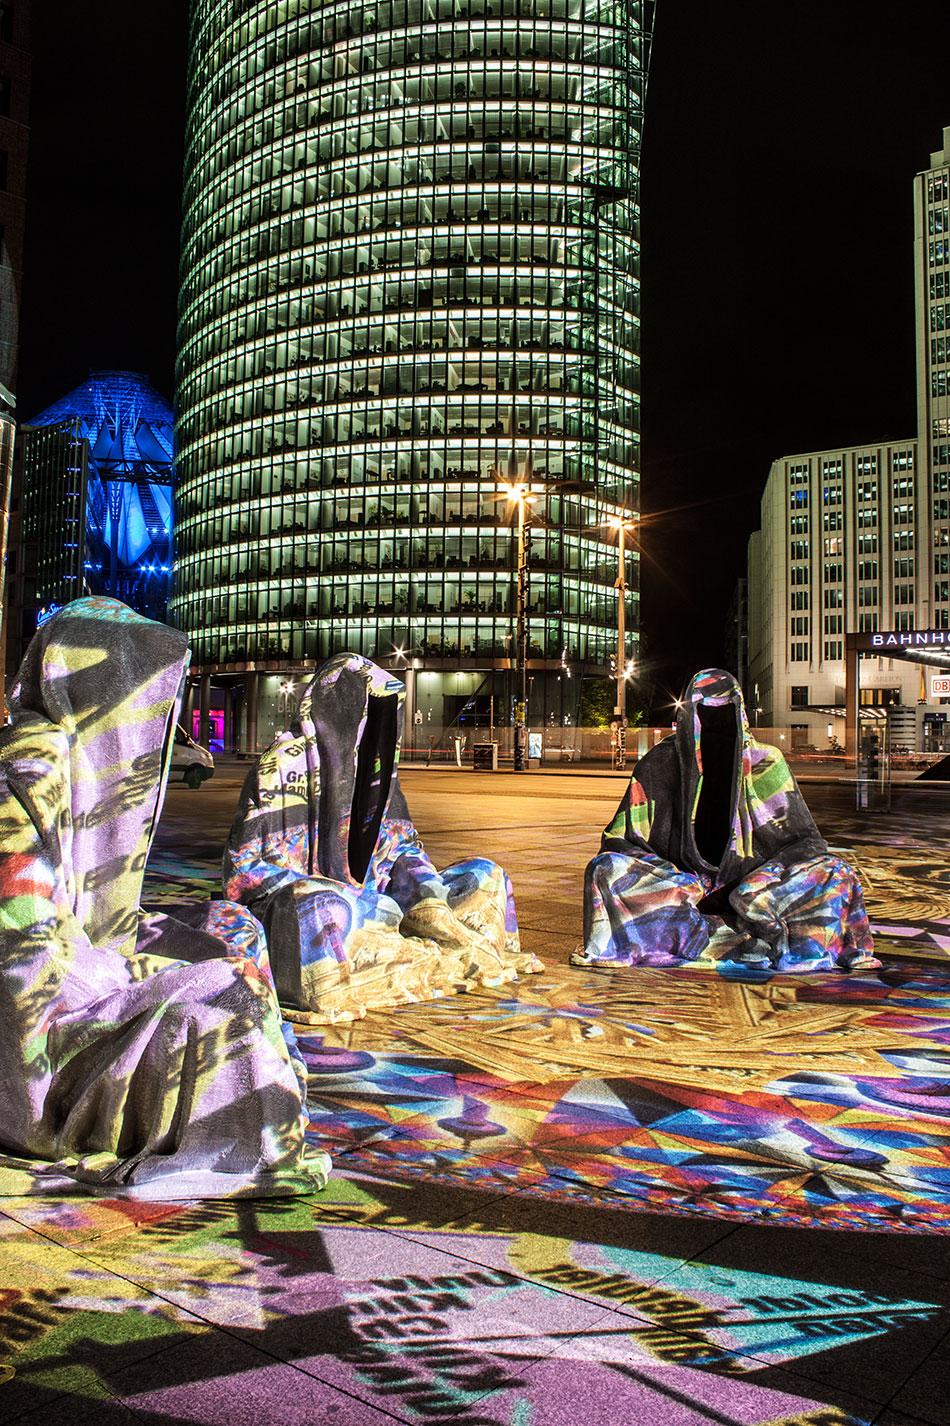 festival-of-lights-berlin-potzdamer-platz-light-art-show-exhibition-lumina-guardians-of-time-manfred-kili-kielnhofer-contemporary-arts-design-large-scale-monumental-public-sculpture-3517